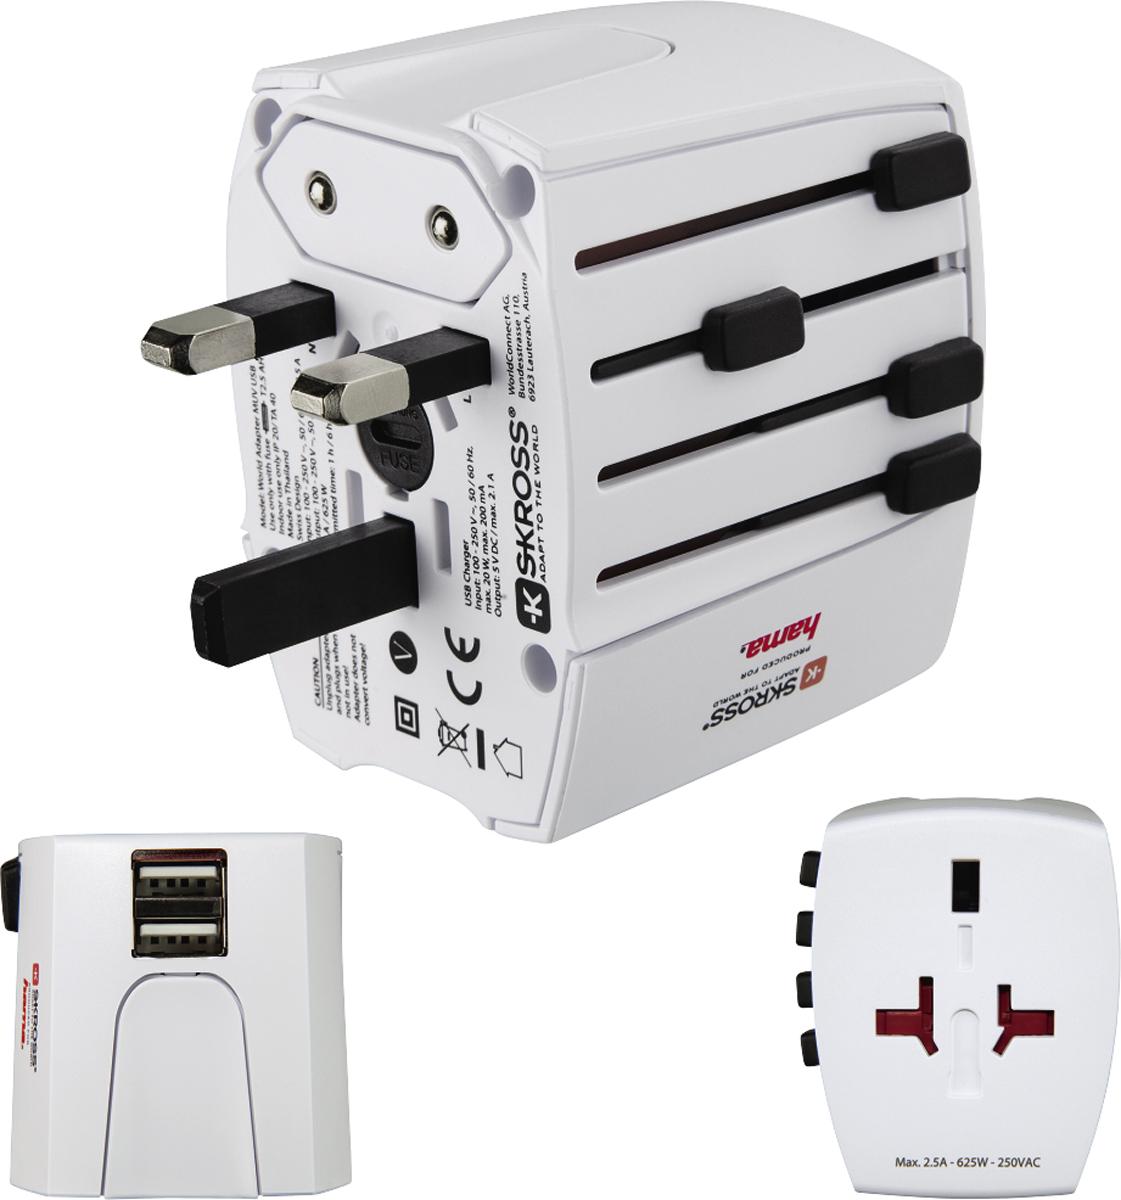 Hama 128226, White сетевой адаптер MUV USB, 2 pins